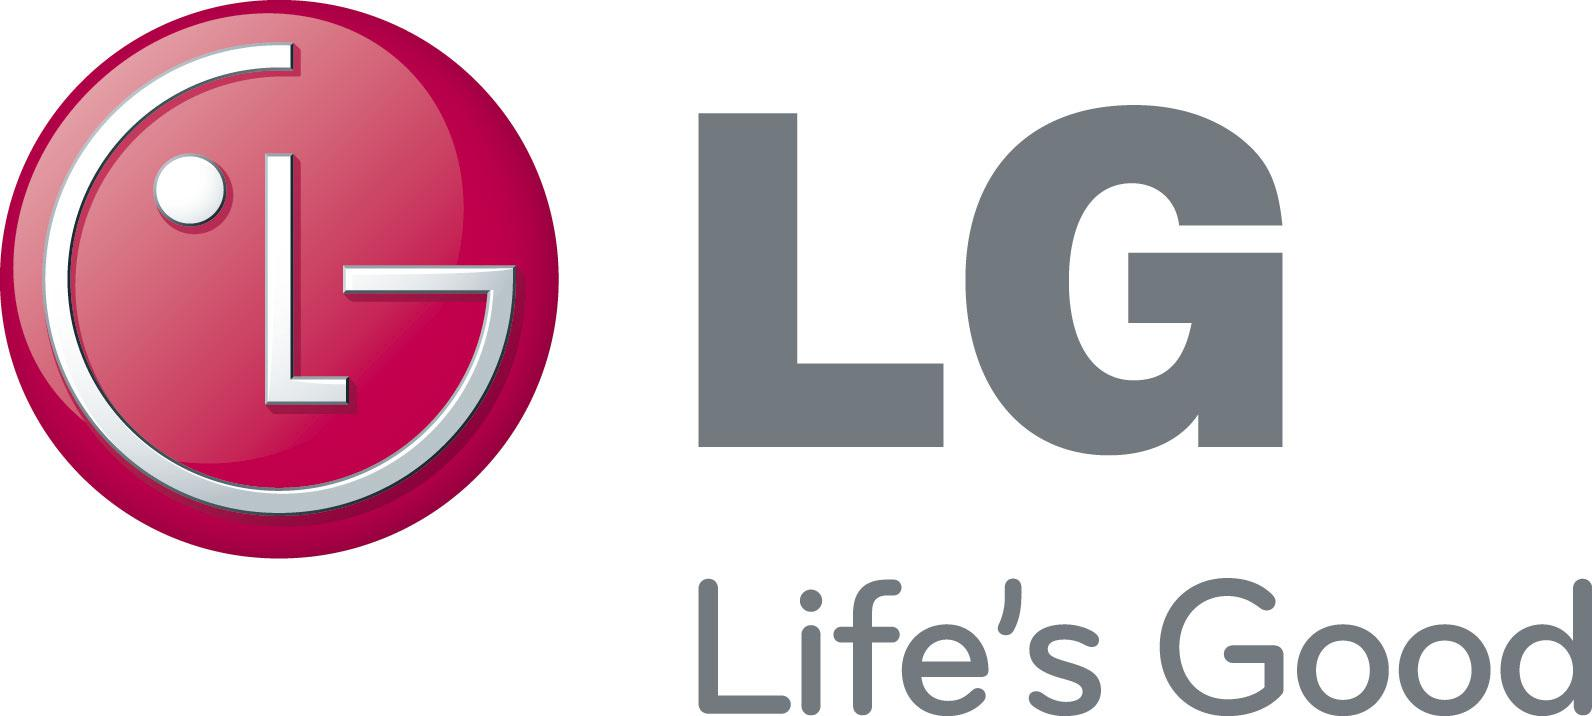 Monitors LG 49WL95CW 49 INCH IPS 5K Curve Monitor